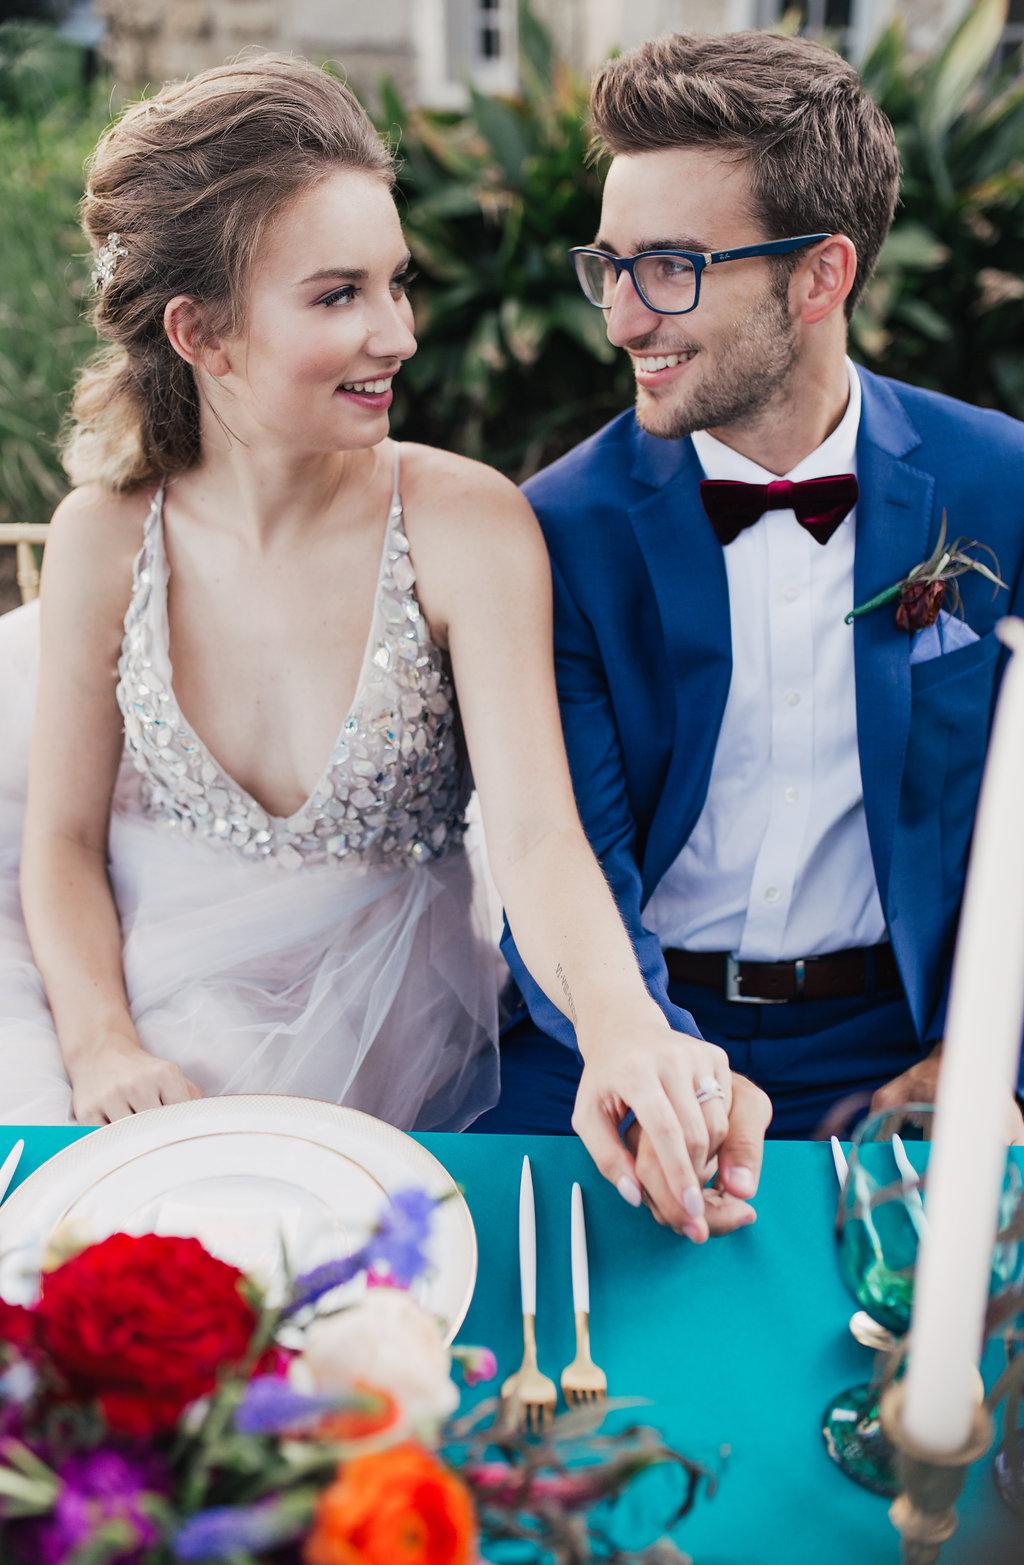 jewel toned wedding ideas - photo by Alondra Vega Photography https://ruffledblog.com/jewel-toned-wedding-ideas-with-a-surprise-proposal